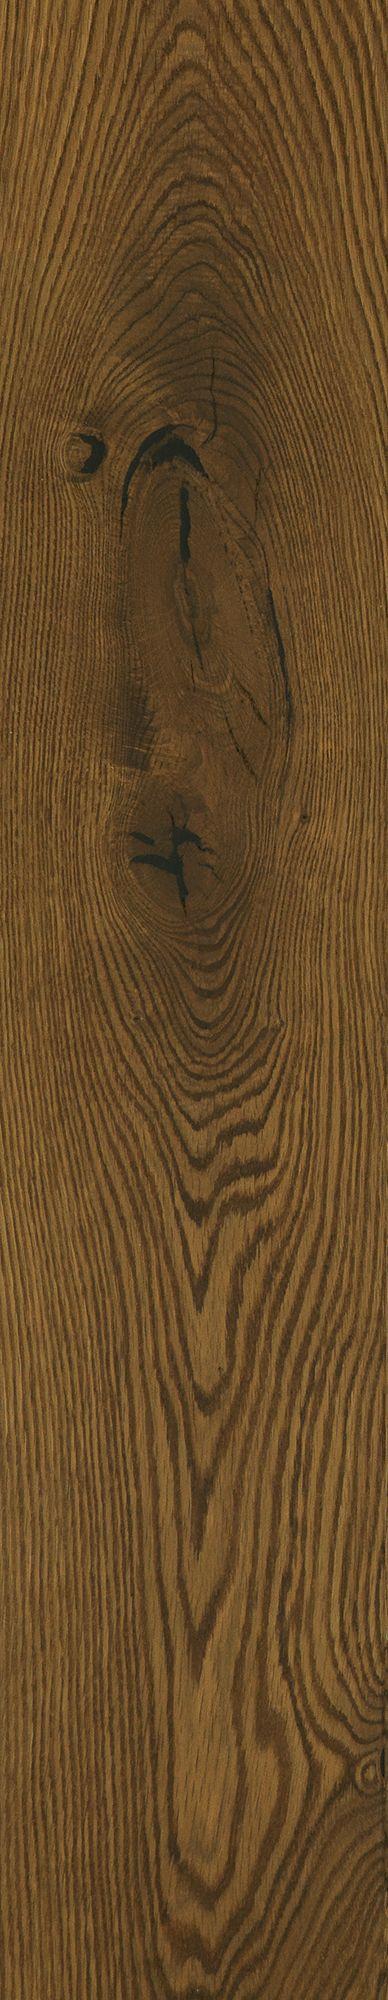 Spiced Hazelnut Oak